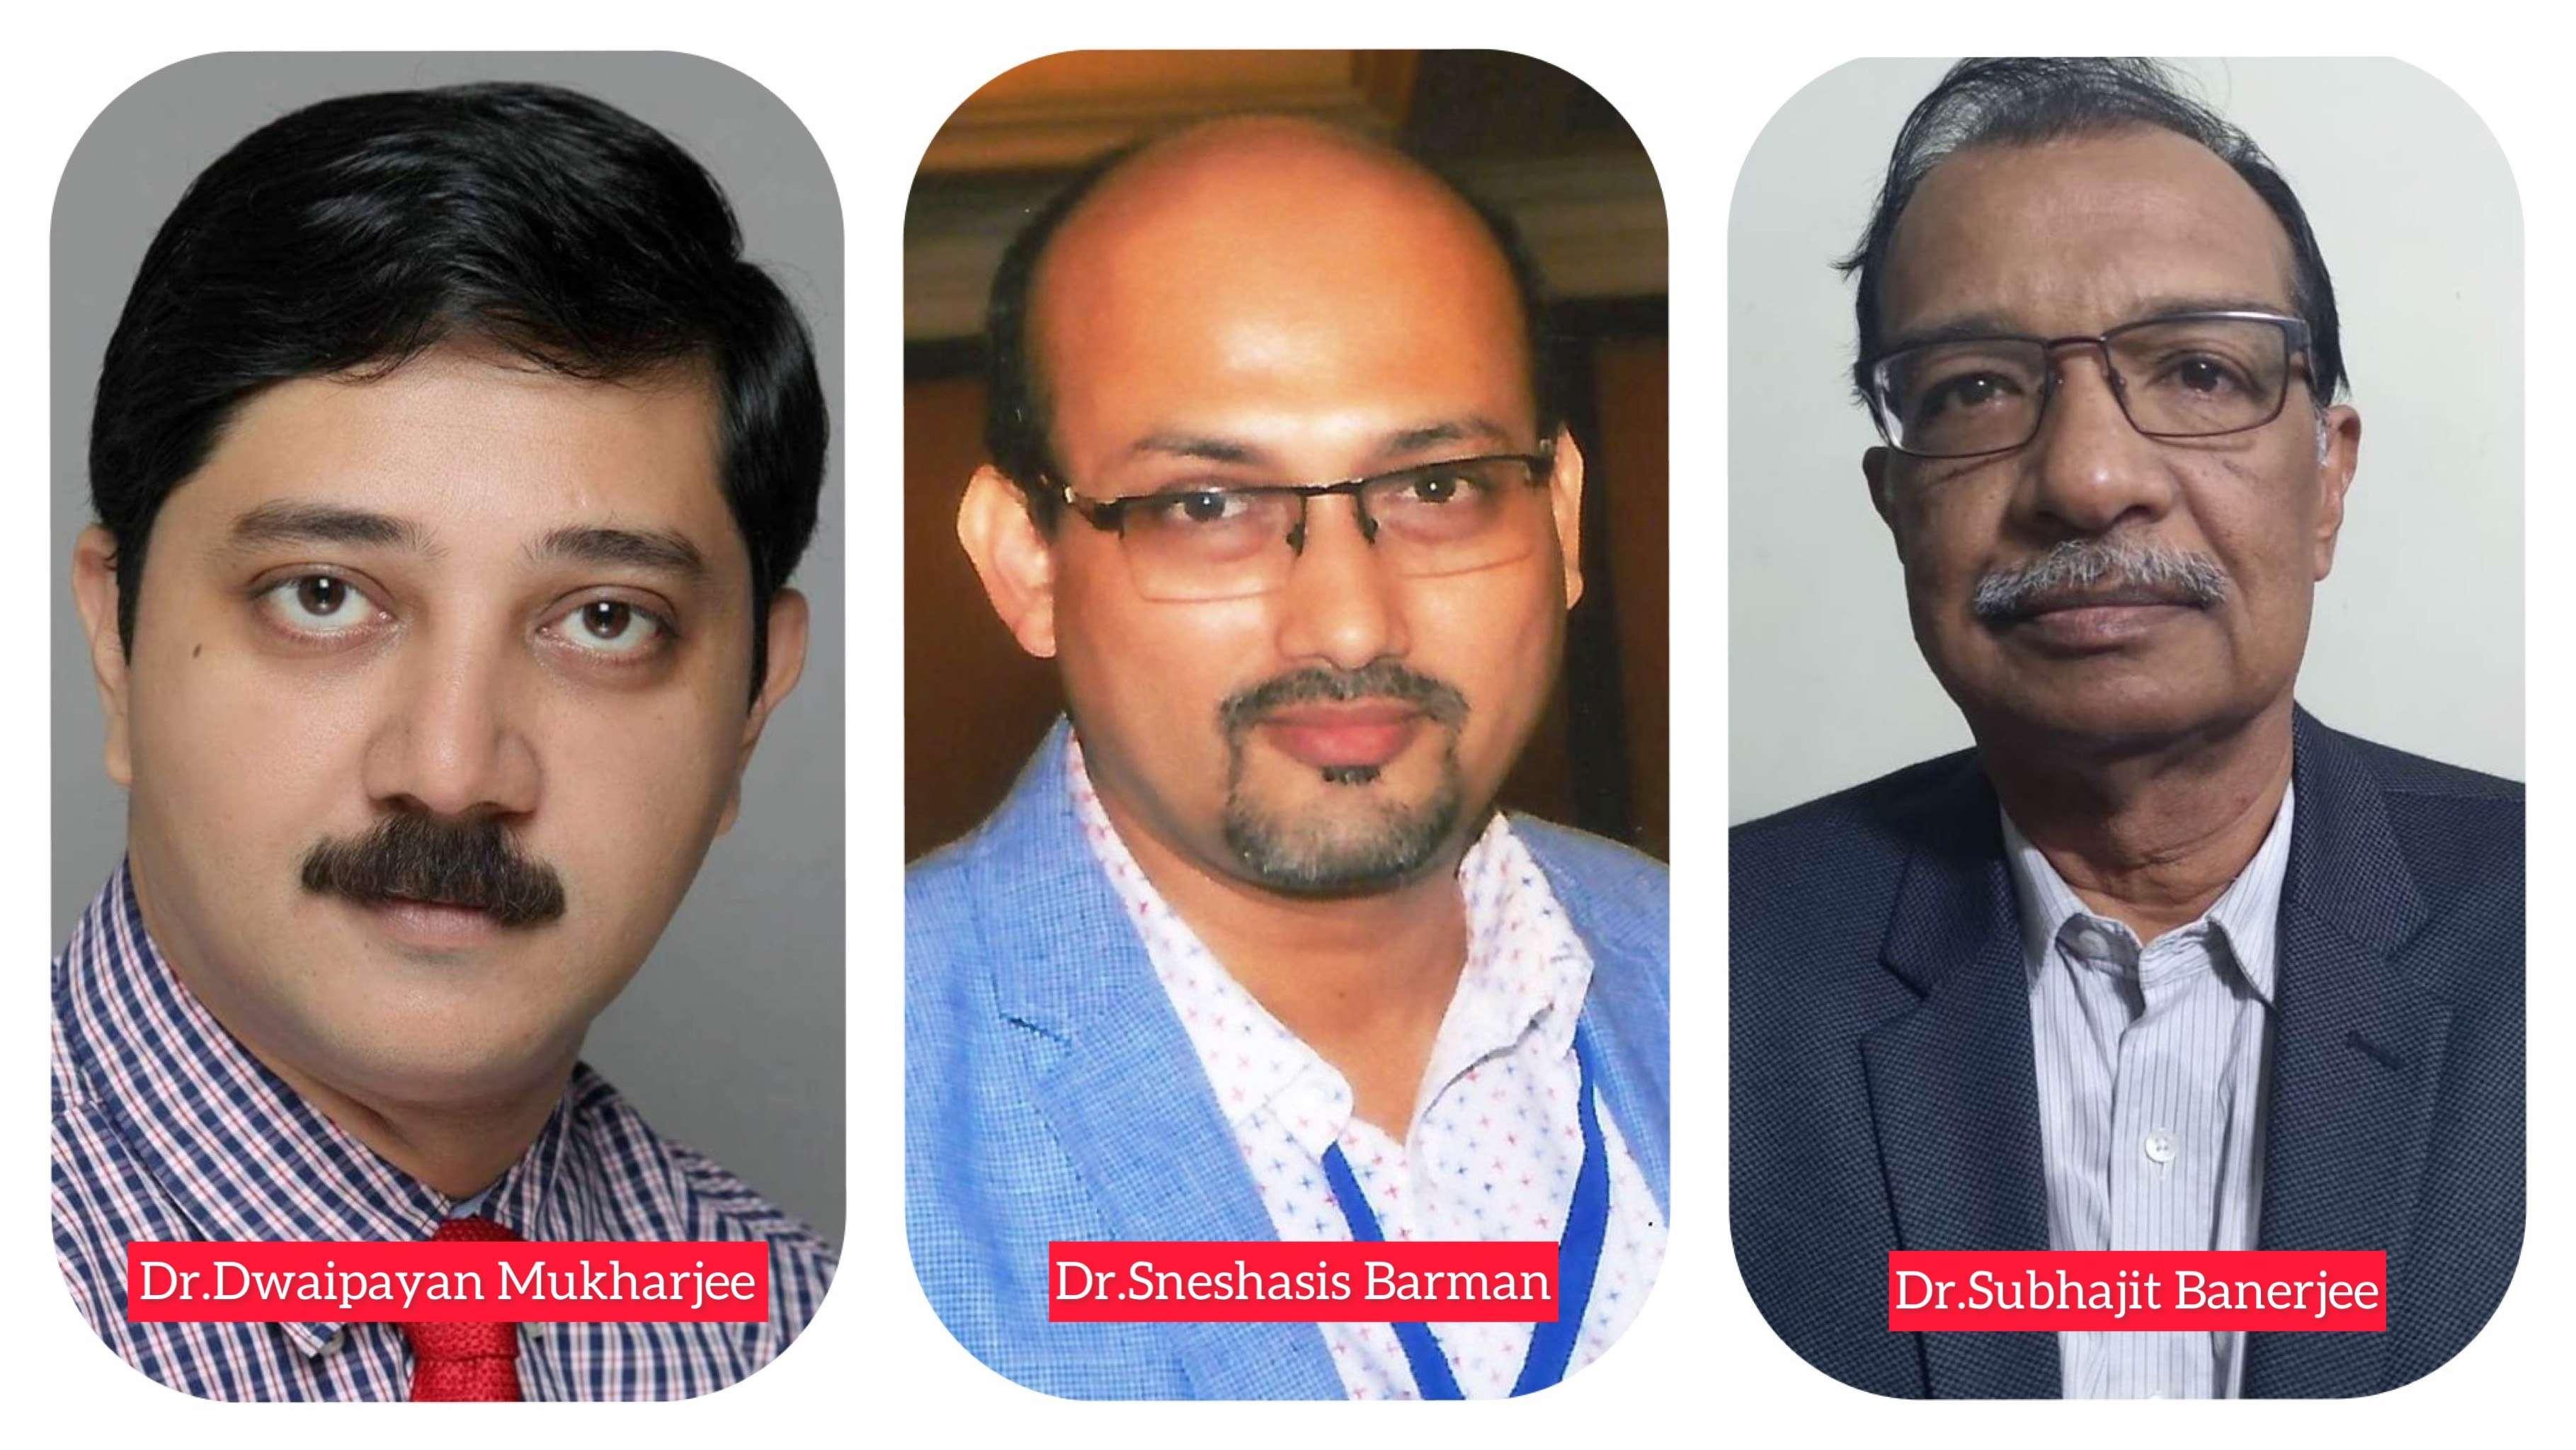 The Association of Otolaryngologist of India,WB